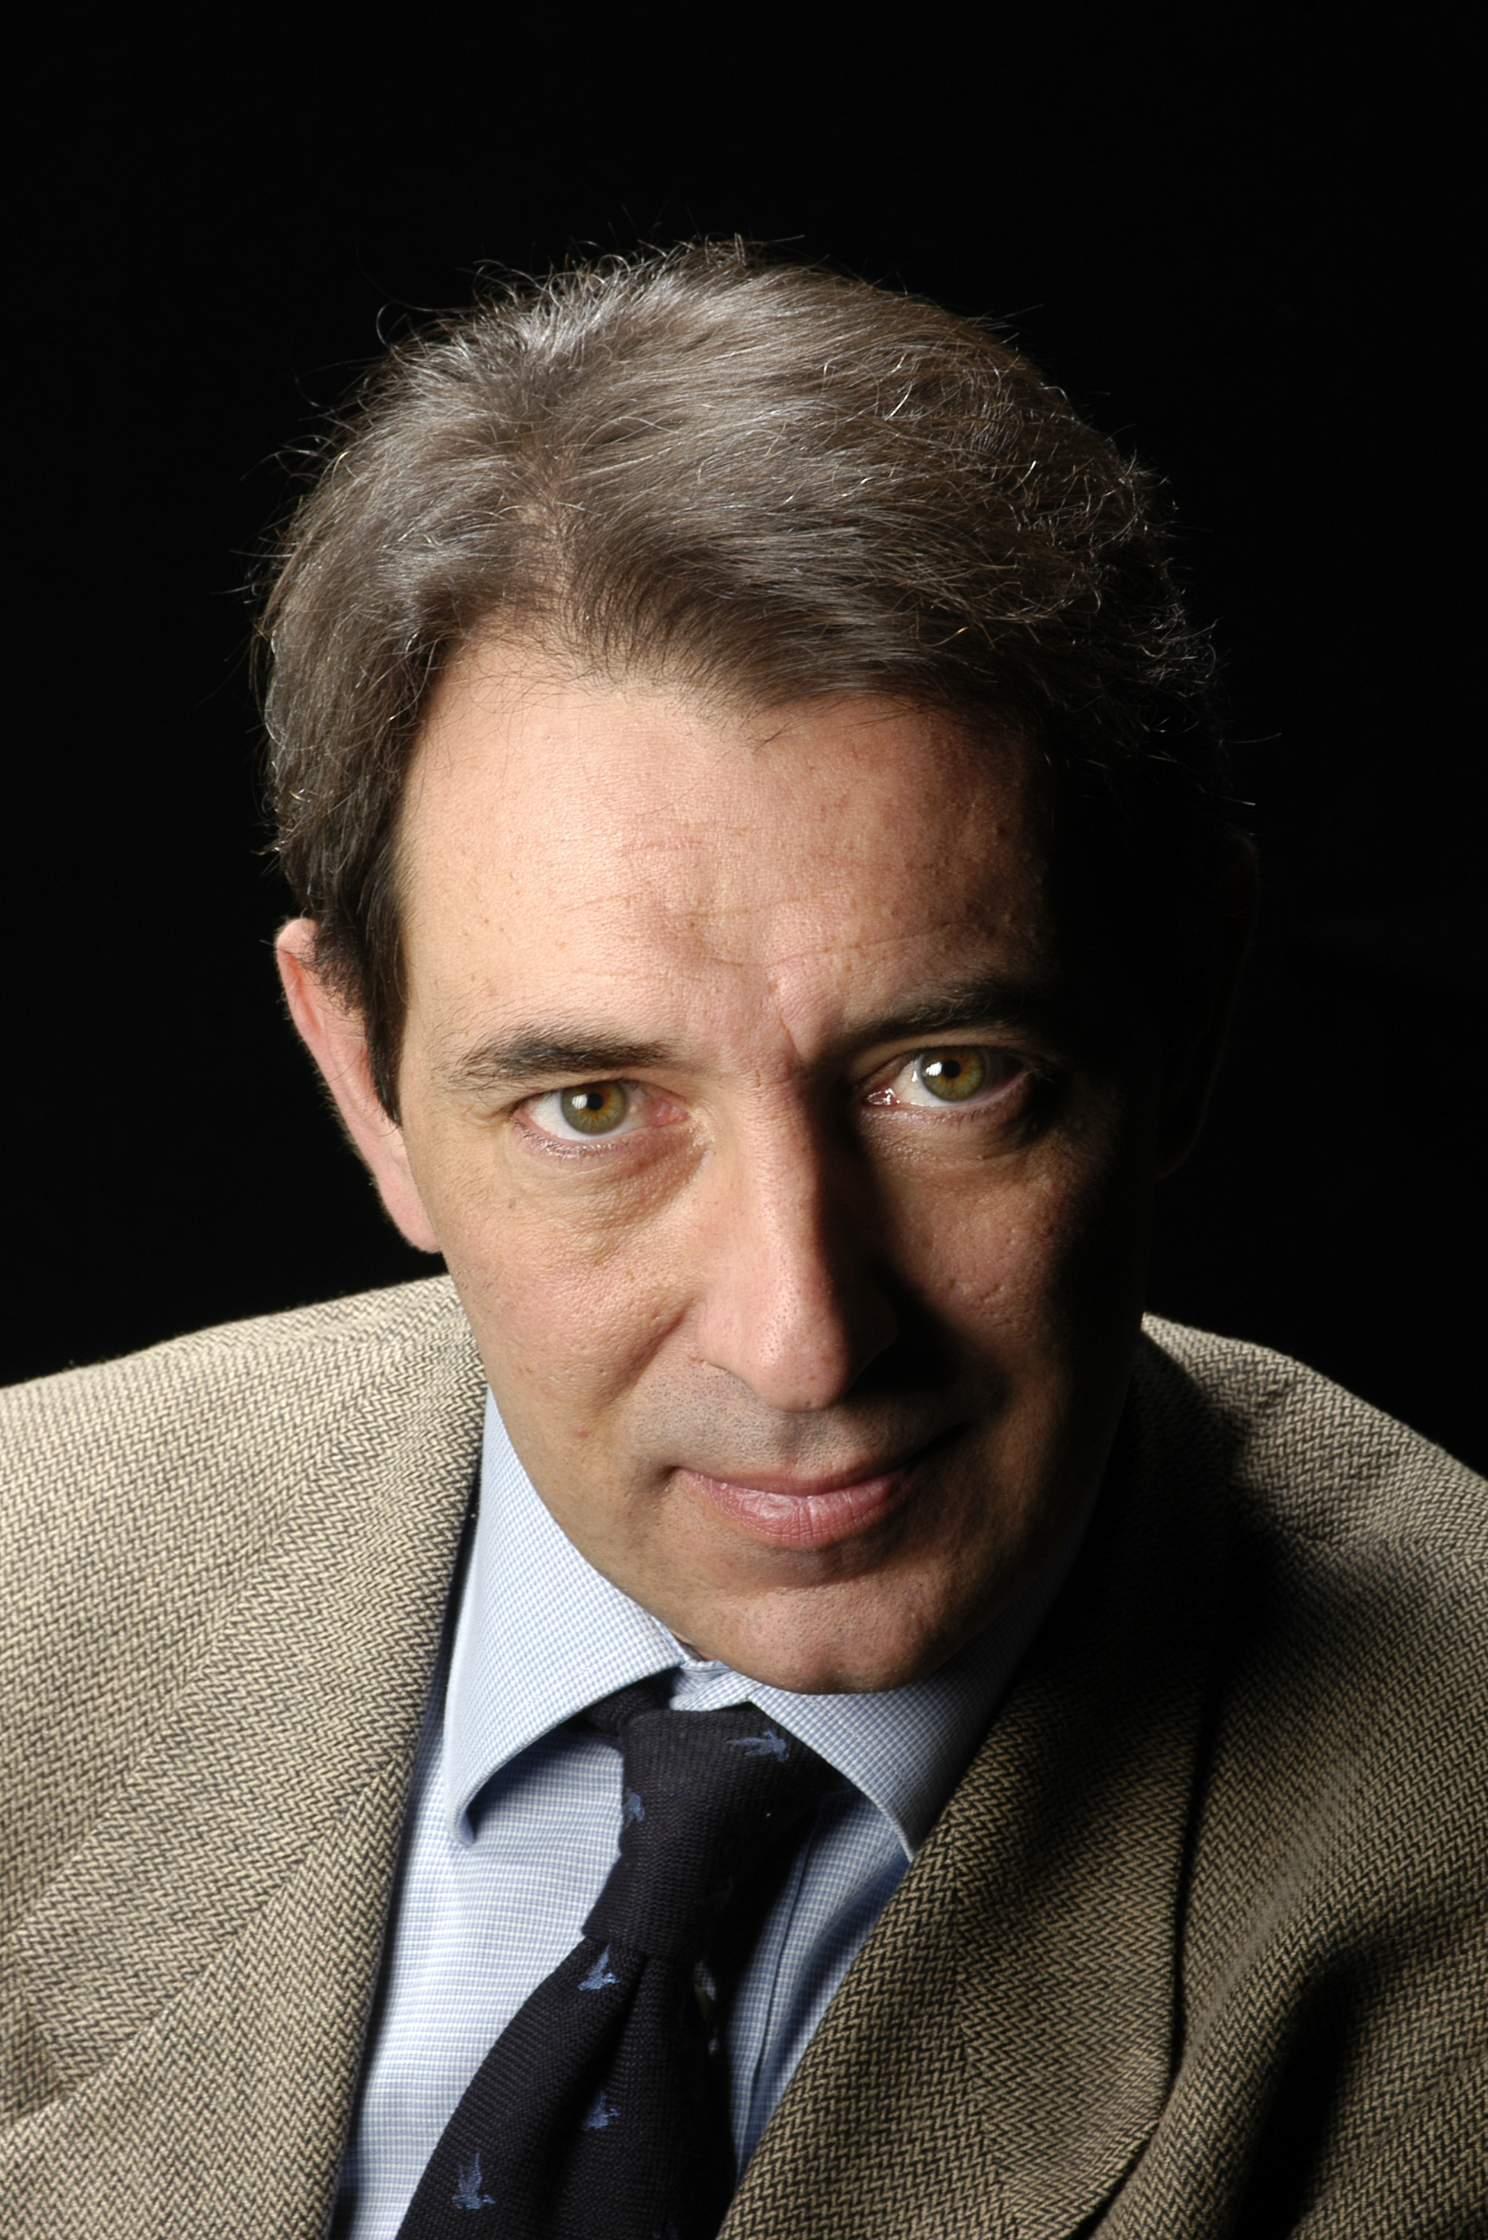 Dr. Lluís Gea Guiral